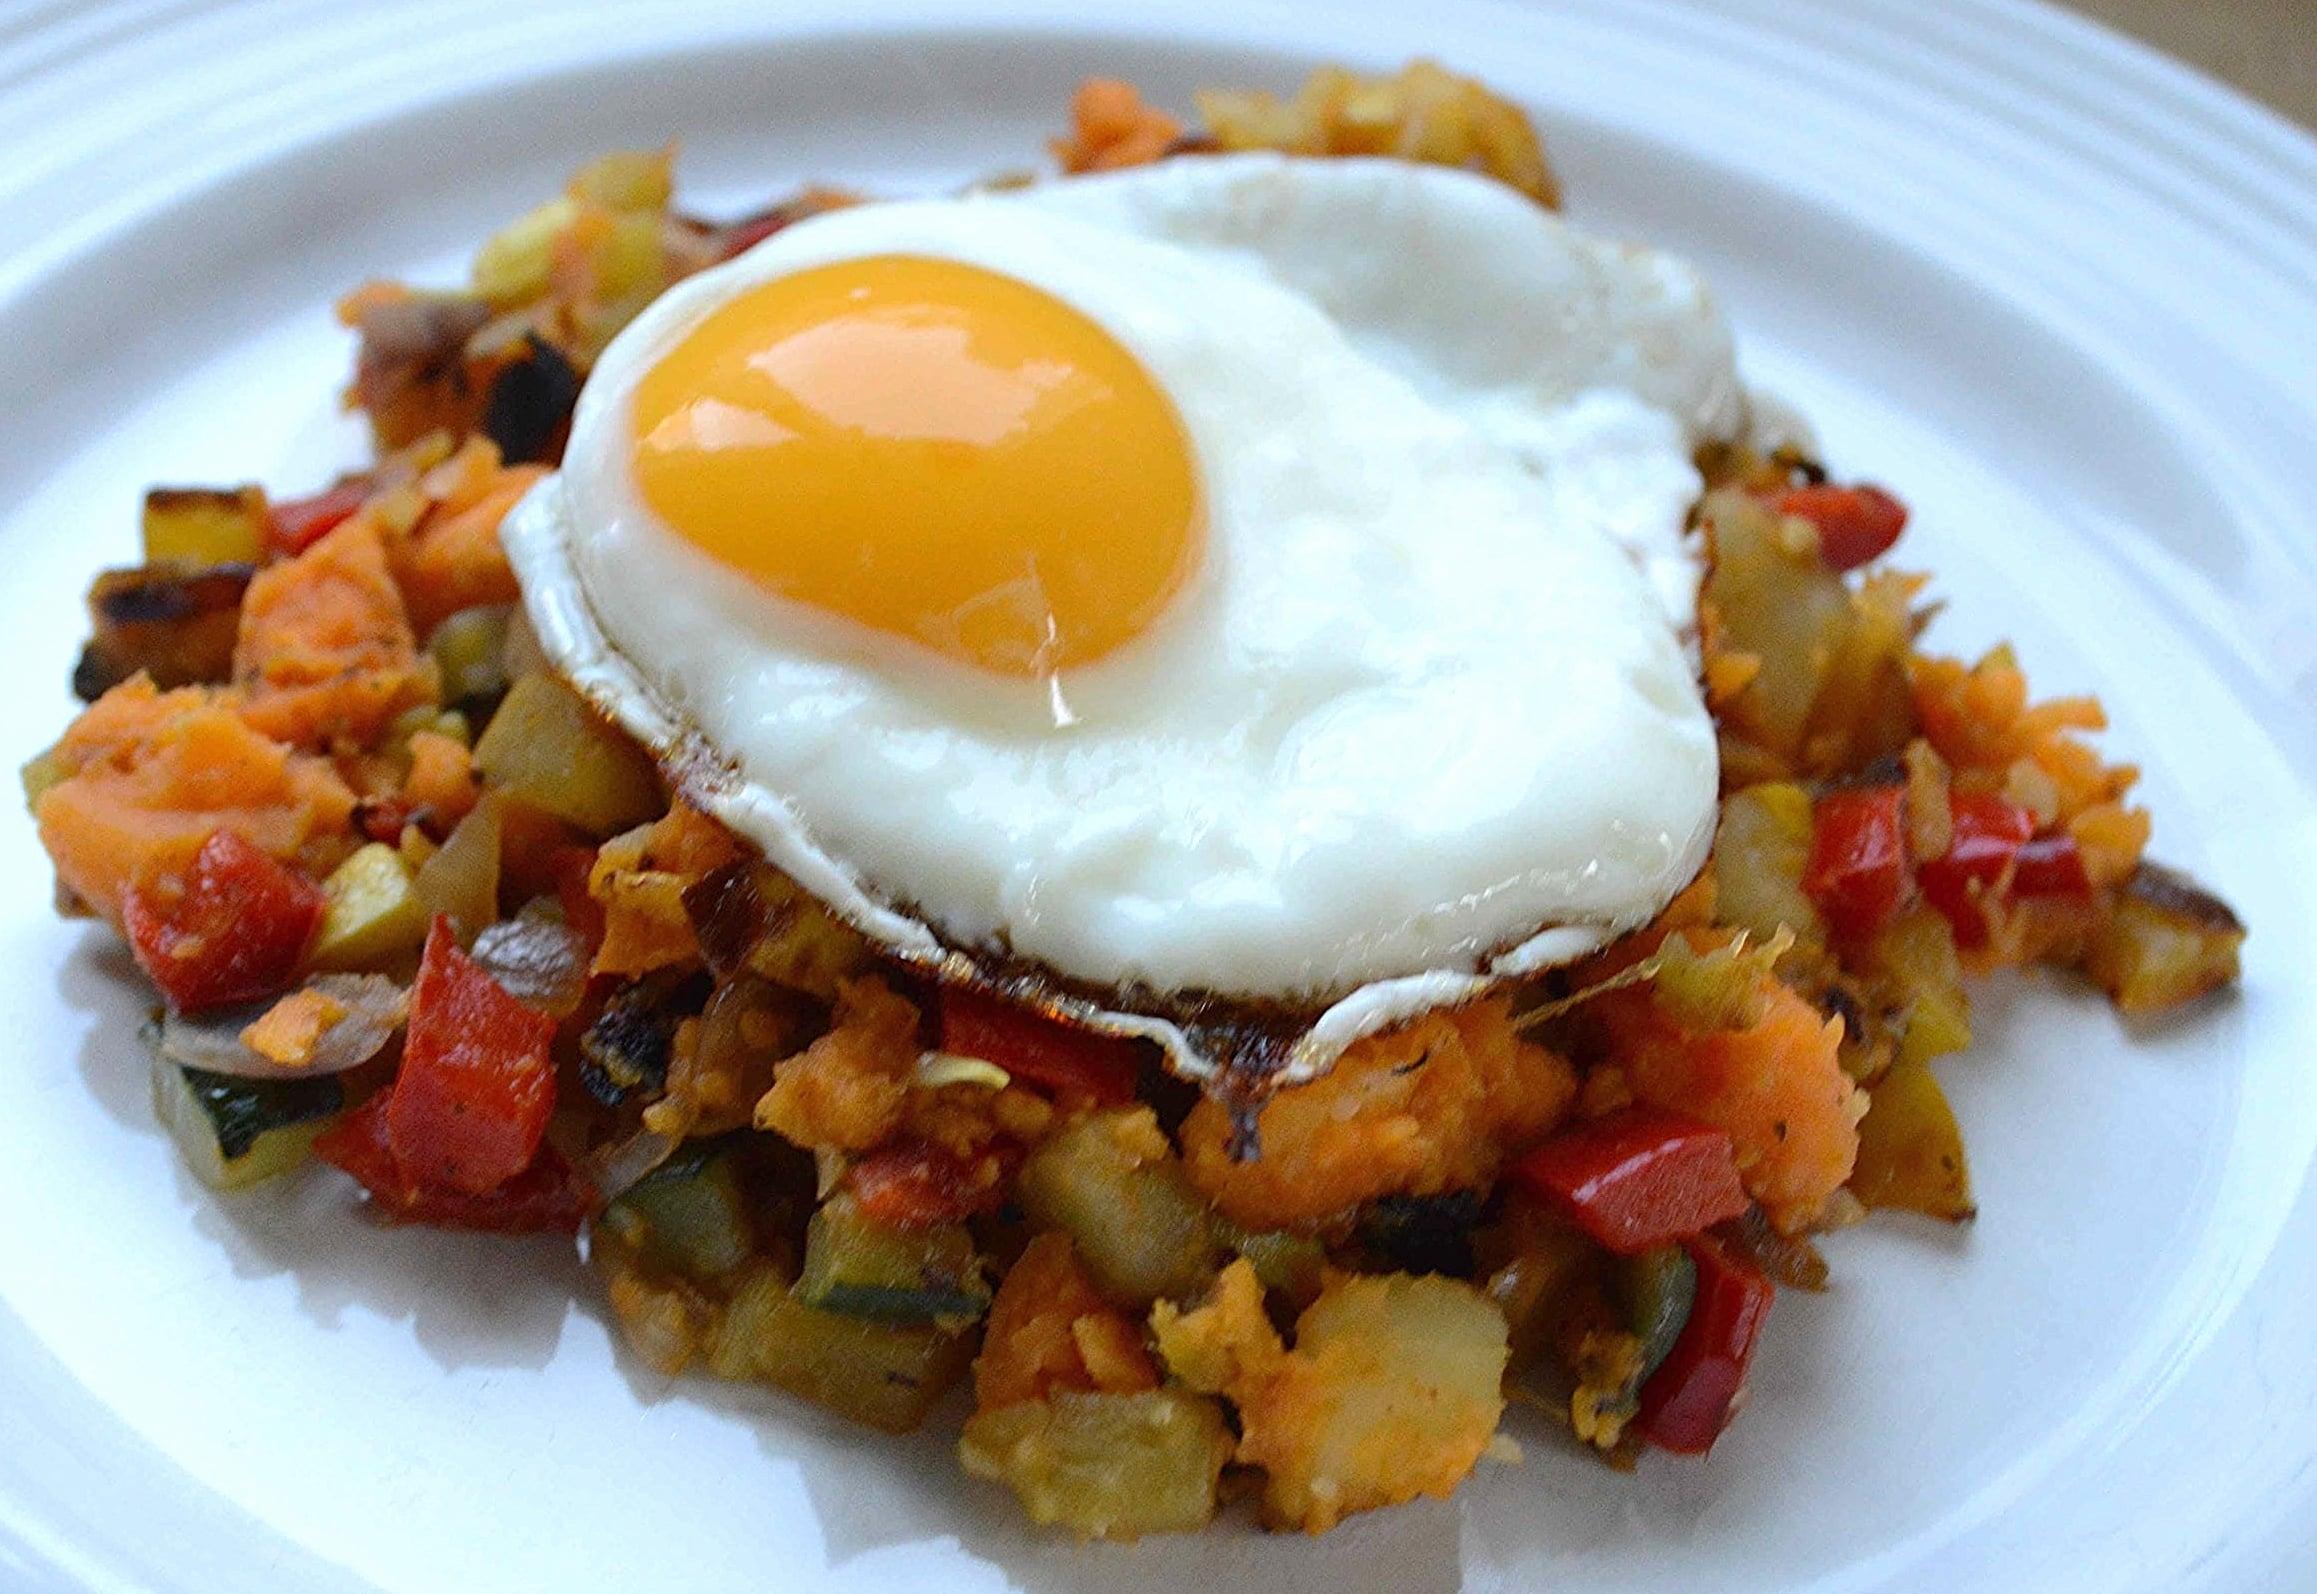 The Pioneer Woman's Breakfast Hash